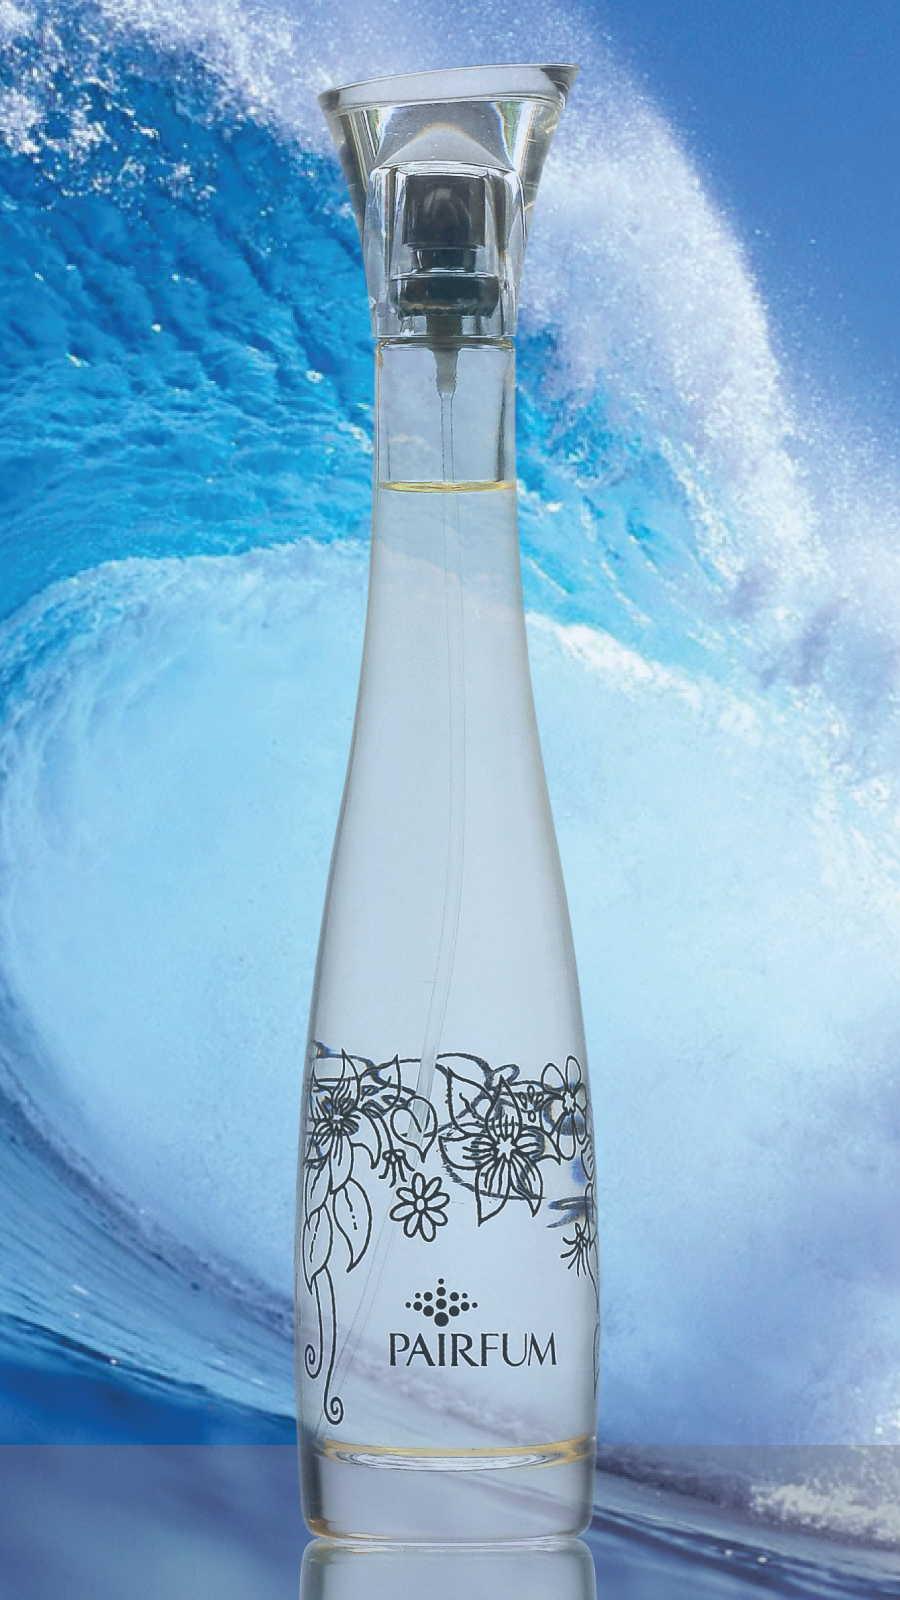 Flacon Room Perfume Spray Marine Wave 9 16